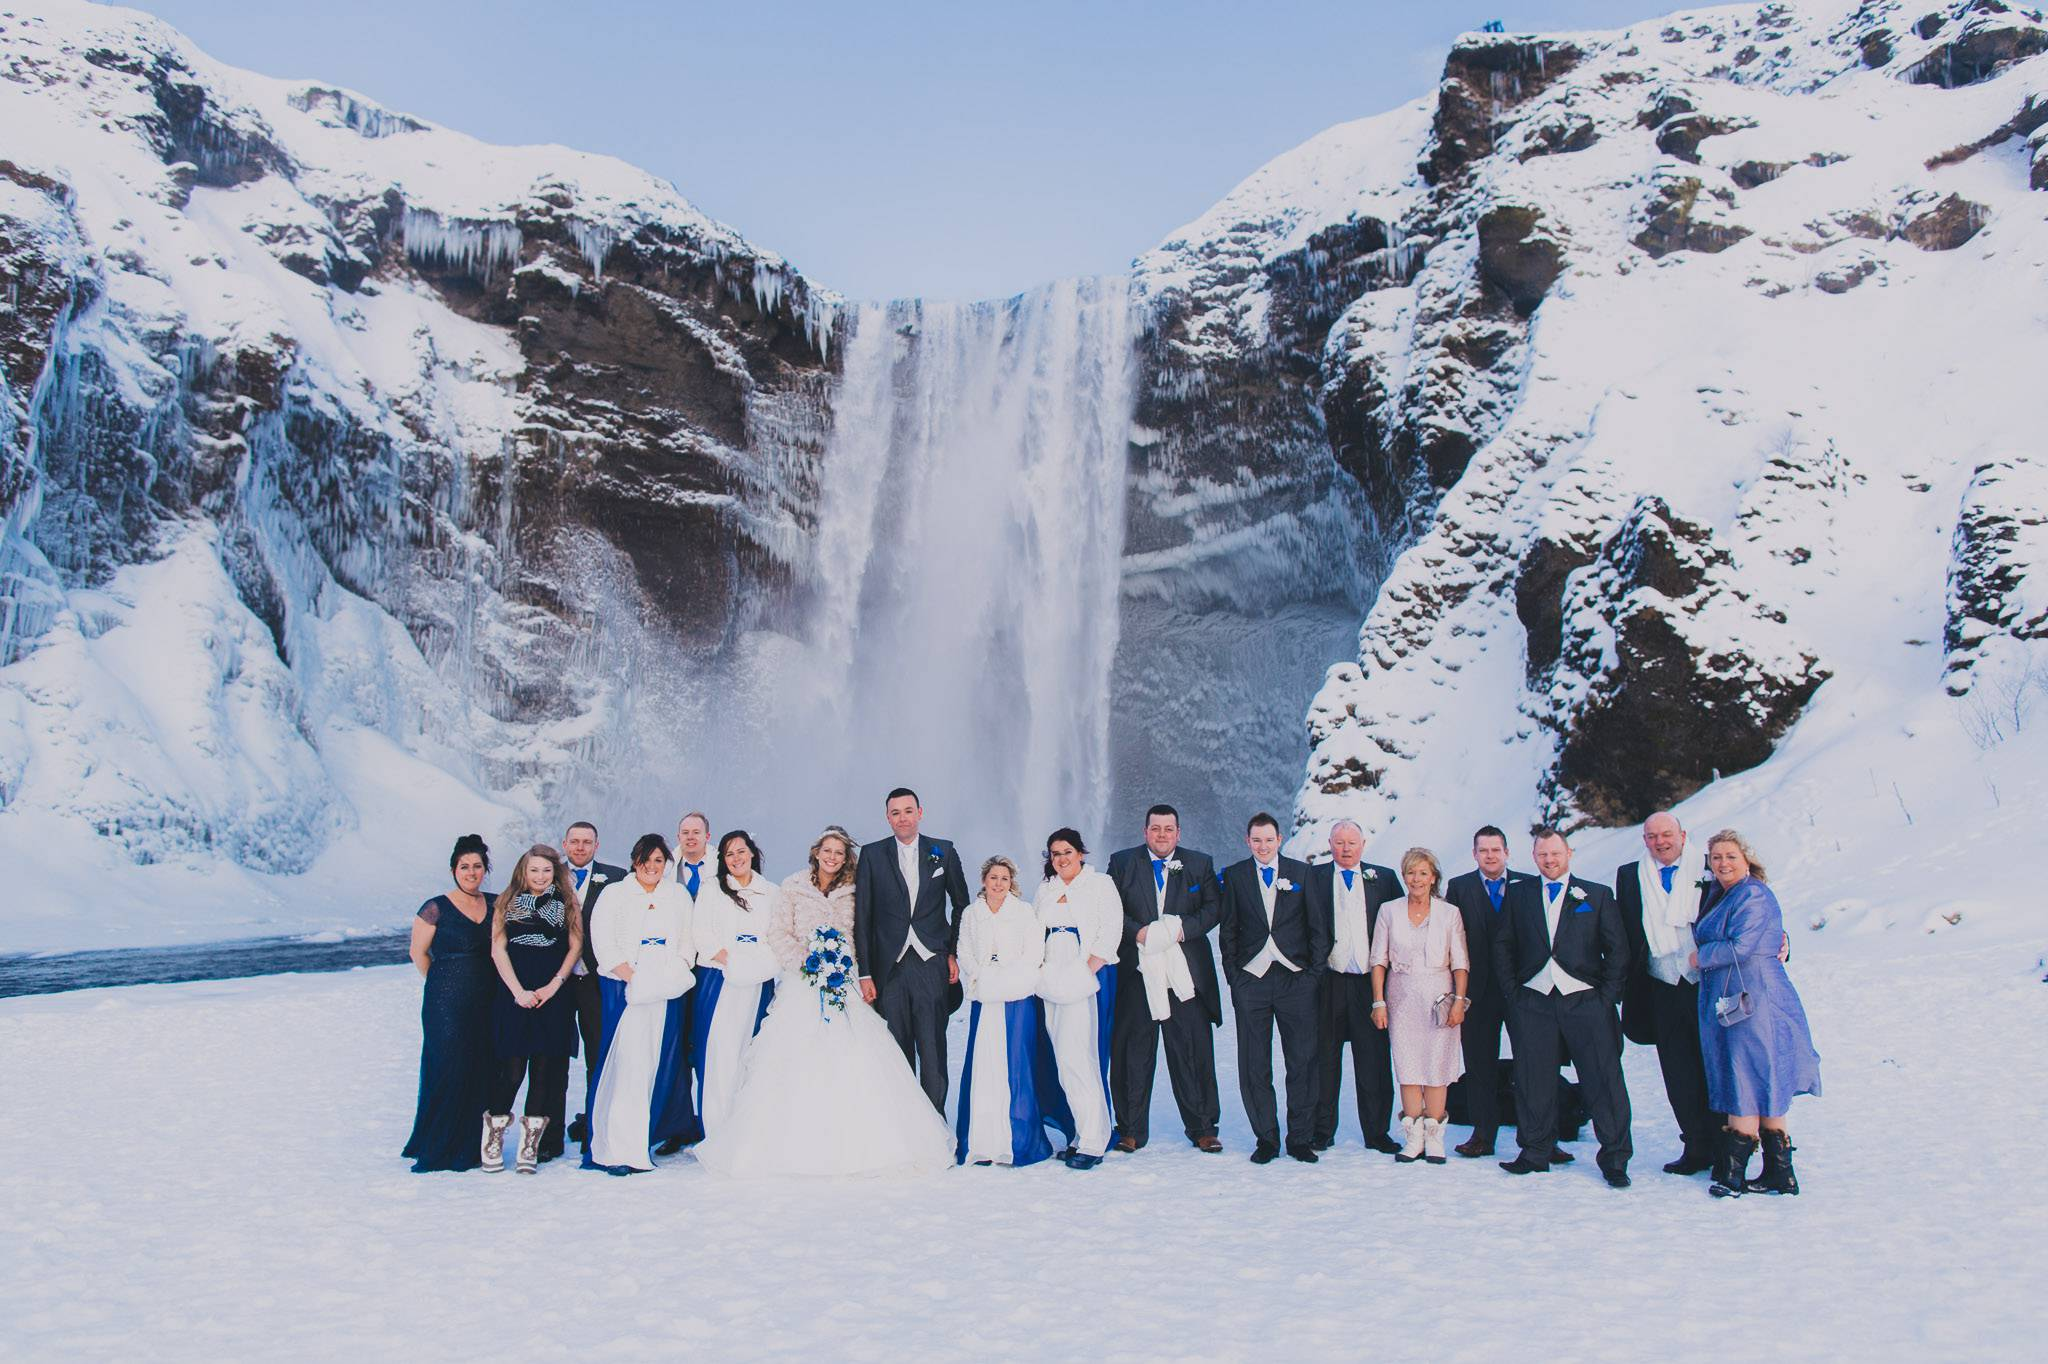 iceland-wedding-photographer 18.jpg